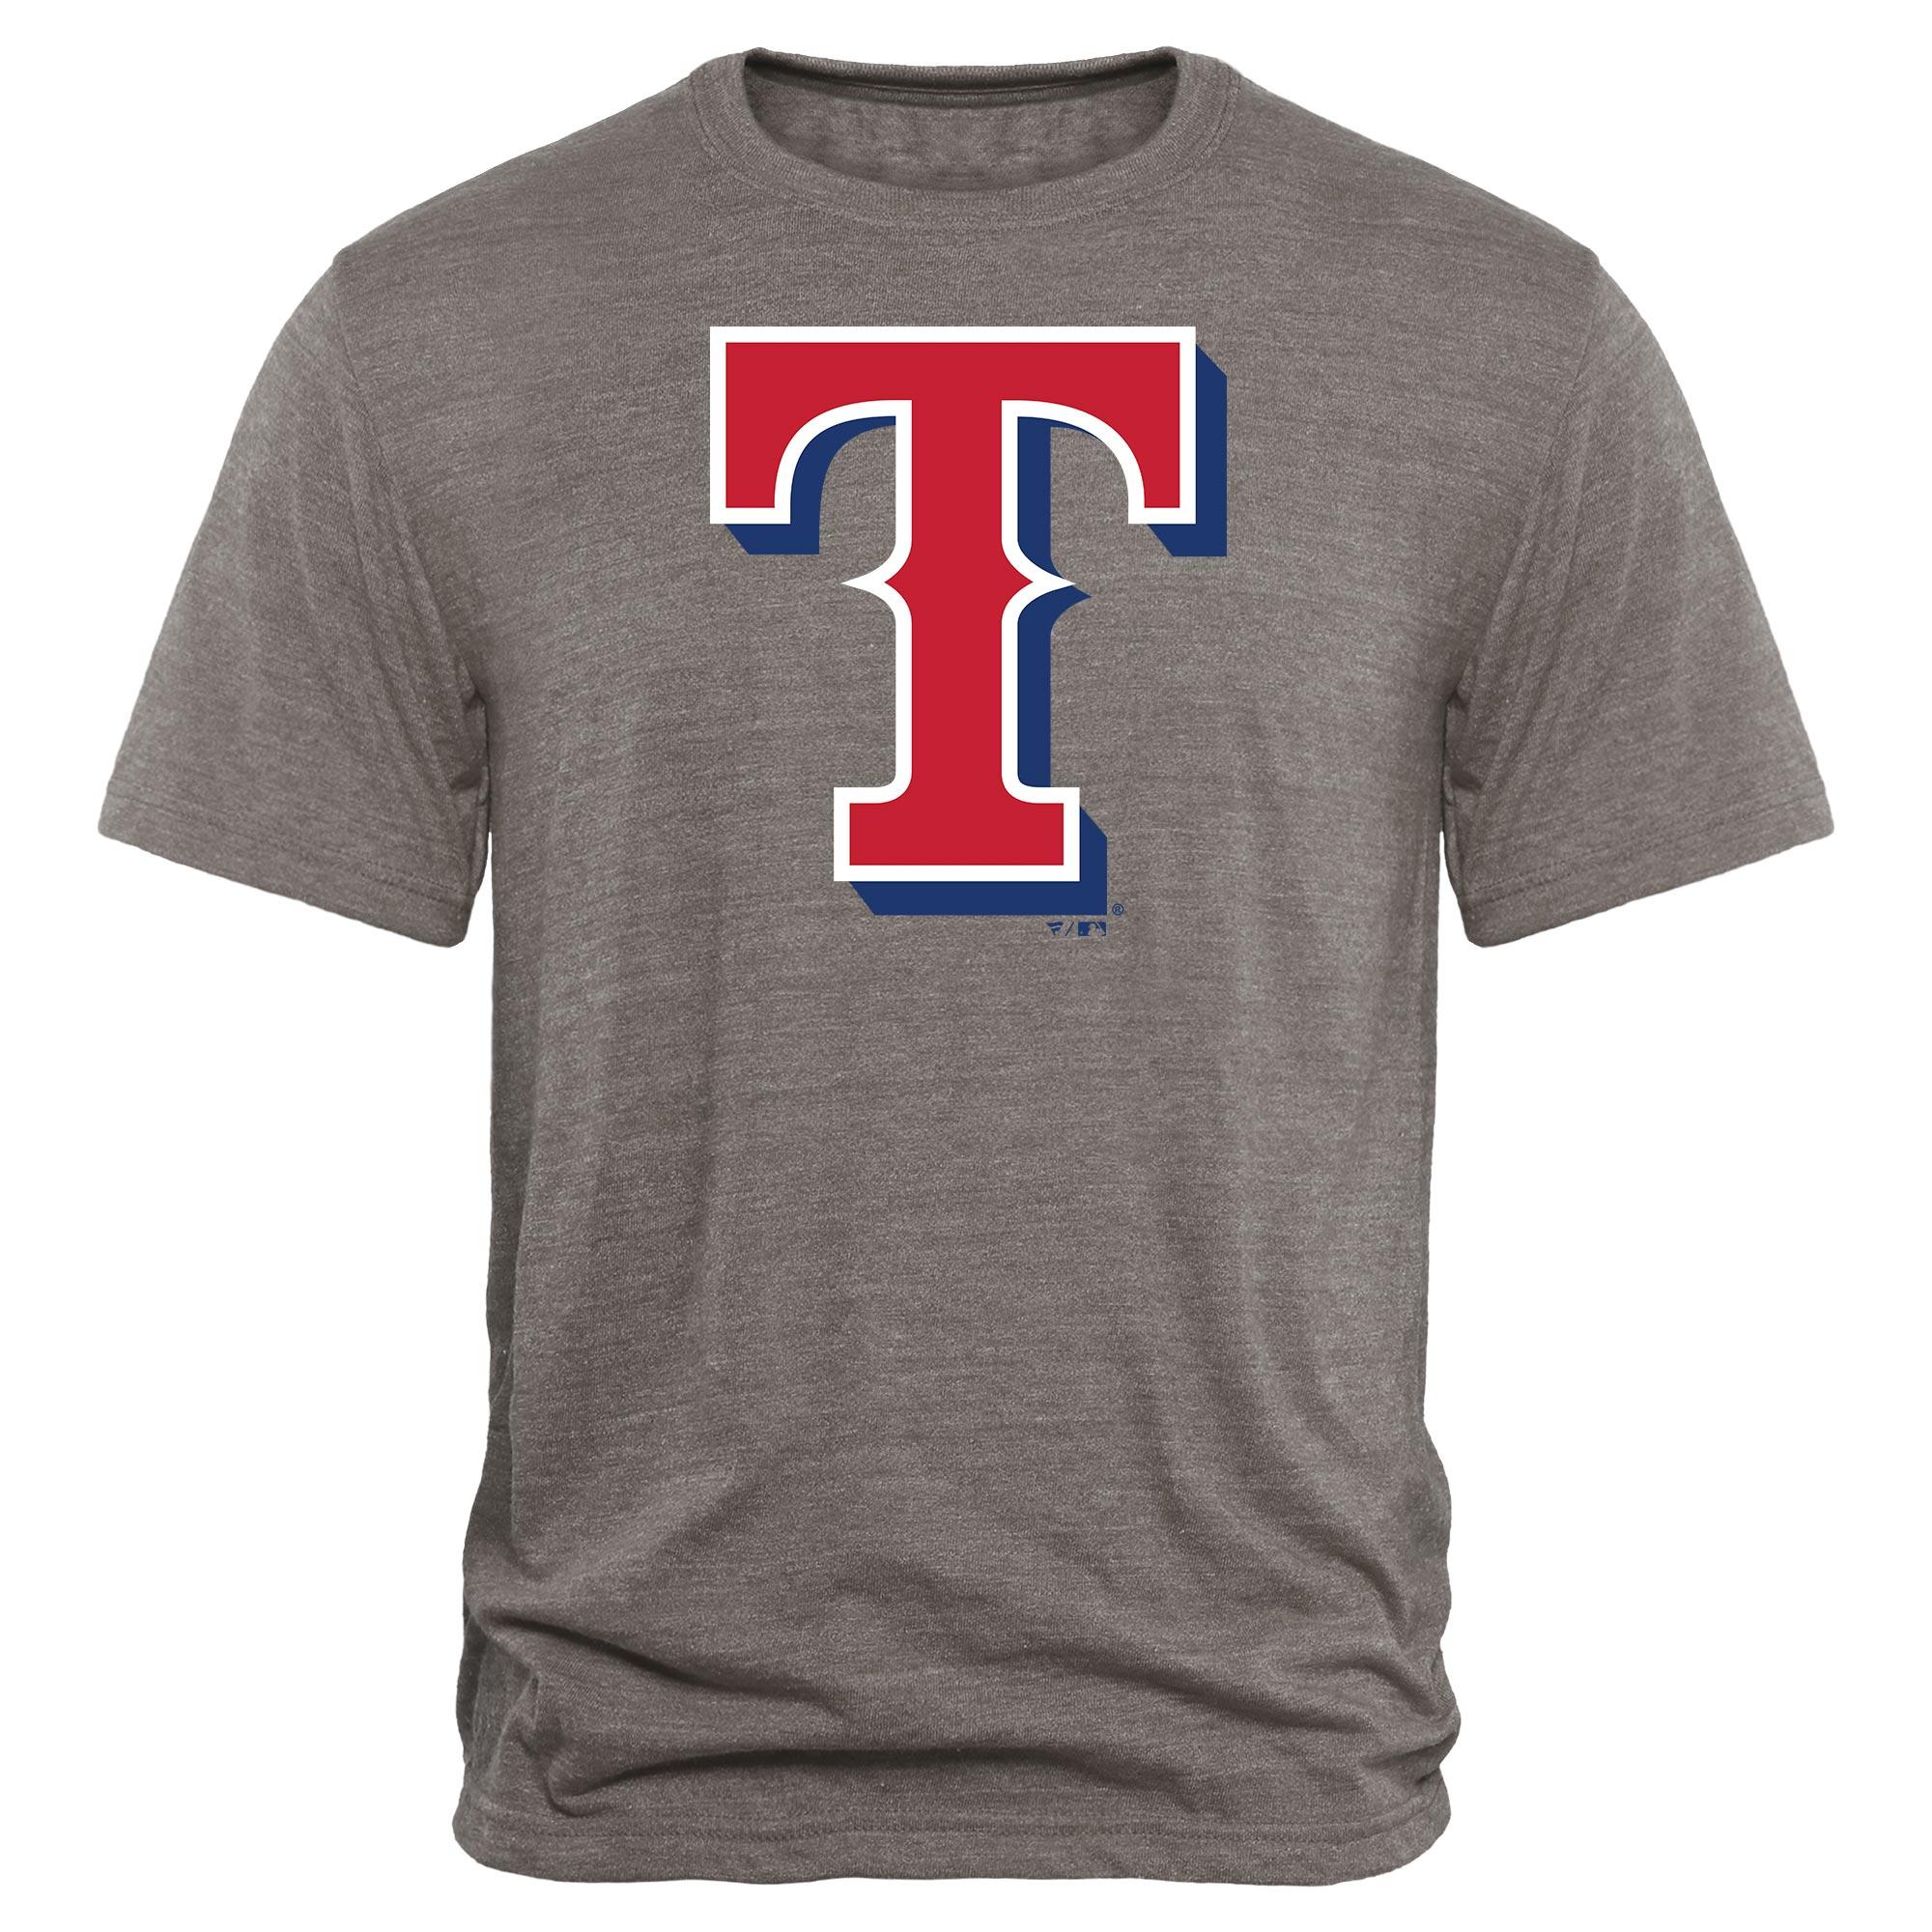 Texas Rangers Rally Primary Logo Tri-Blend T-Shirt - Heathered Gray